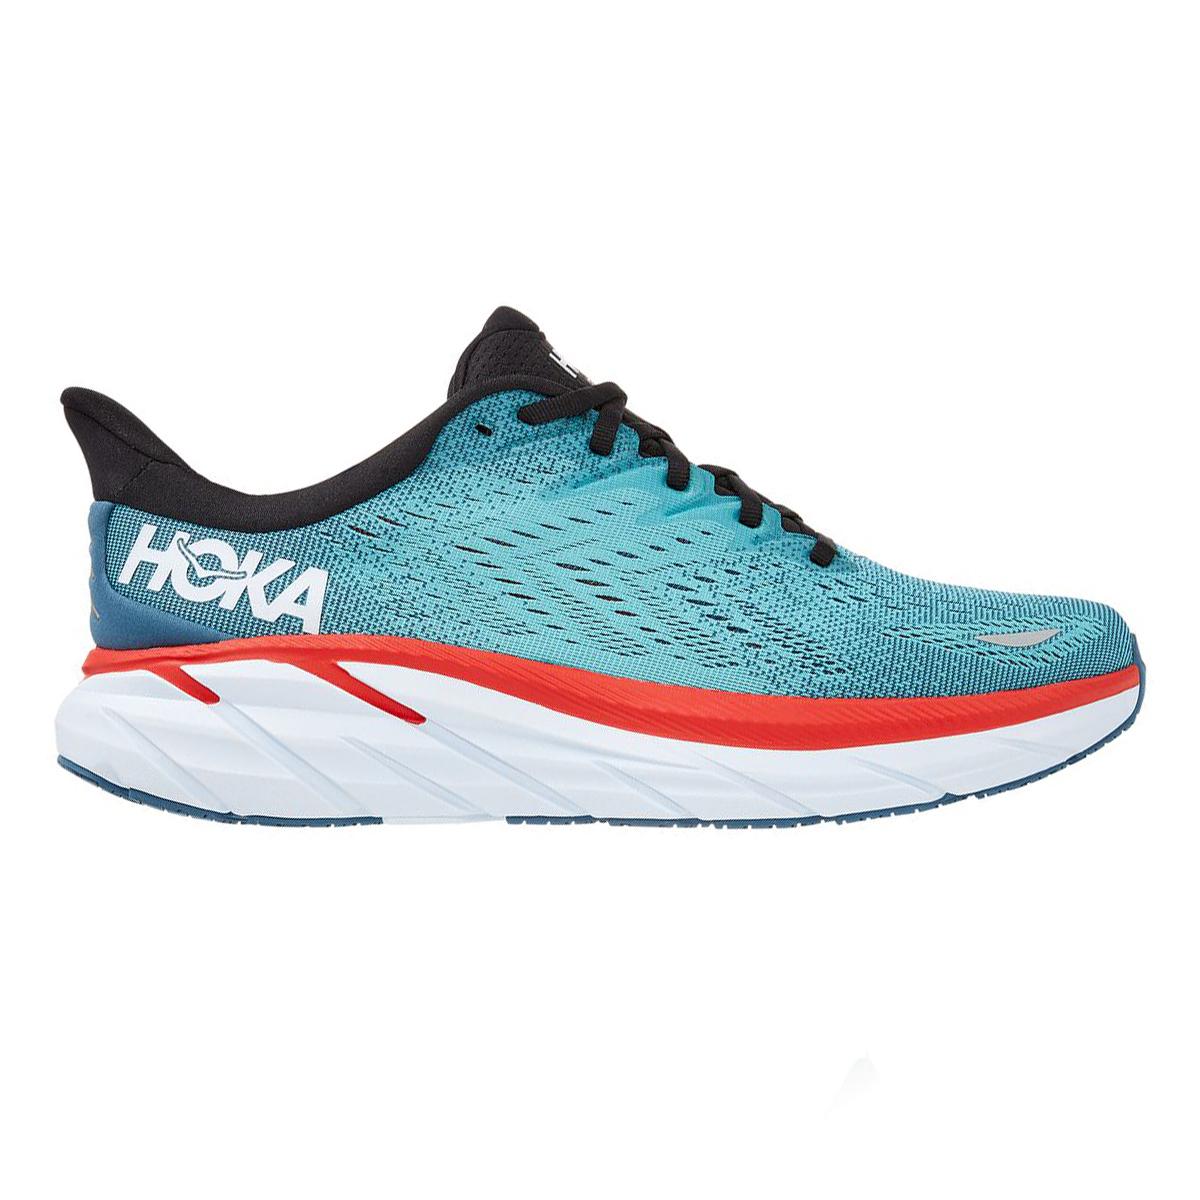 Men's Hoka One One Clifton 8 Running Shoe - Color: Real Teal/Aquarelle - Size: 7 - Width: Regular, Real Teal/Aquarelle, large, image 1